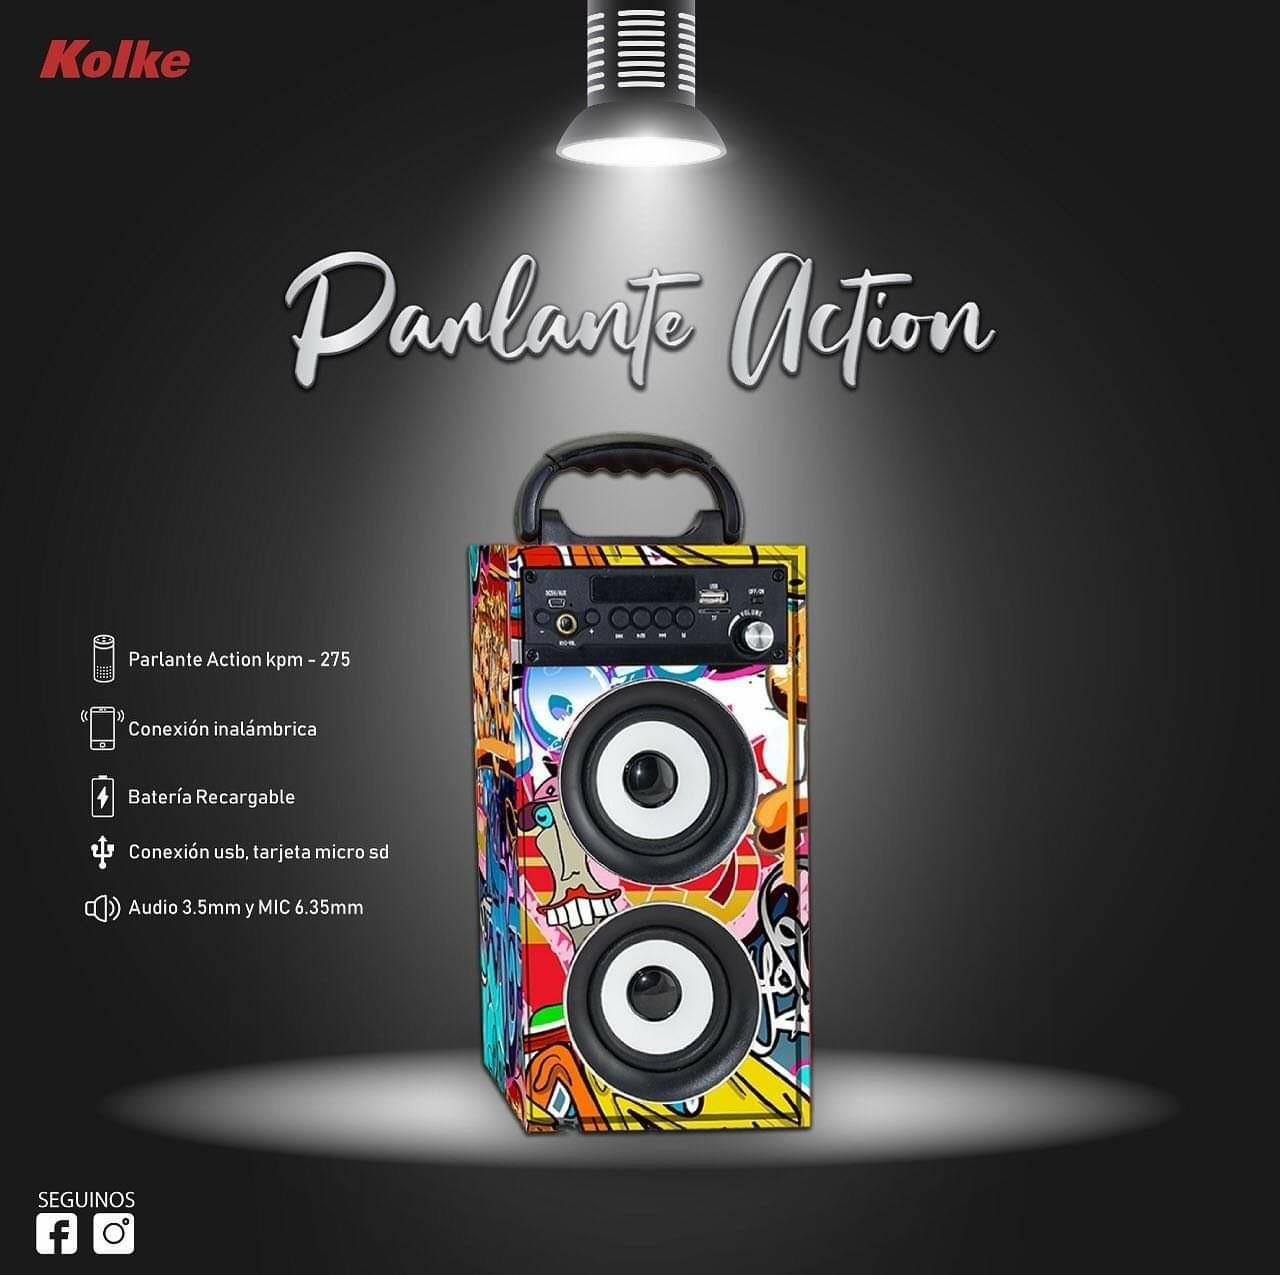 Caixa de som portatil kolke KPM 275